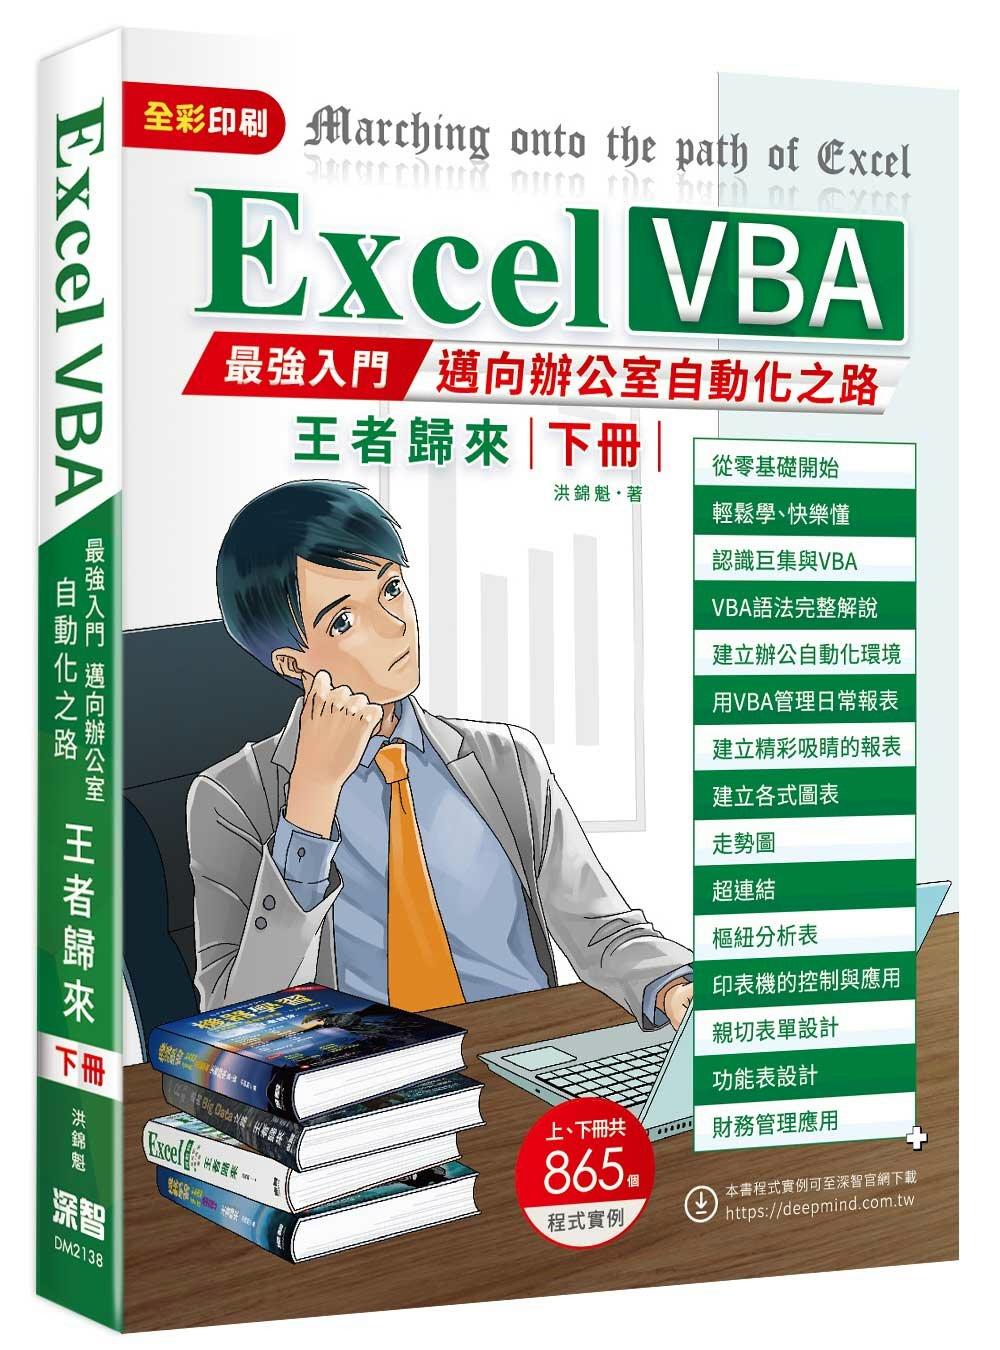 Excel VBA最強入門邁向...